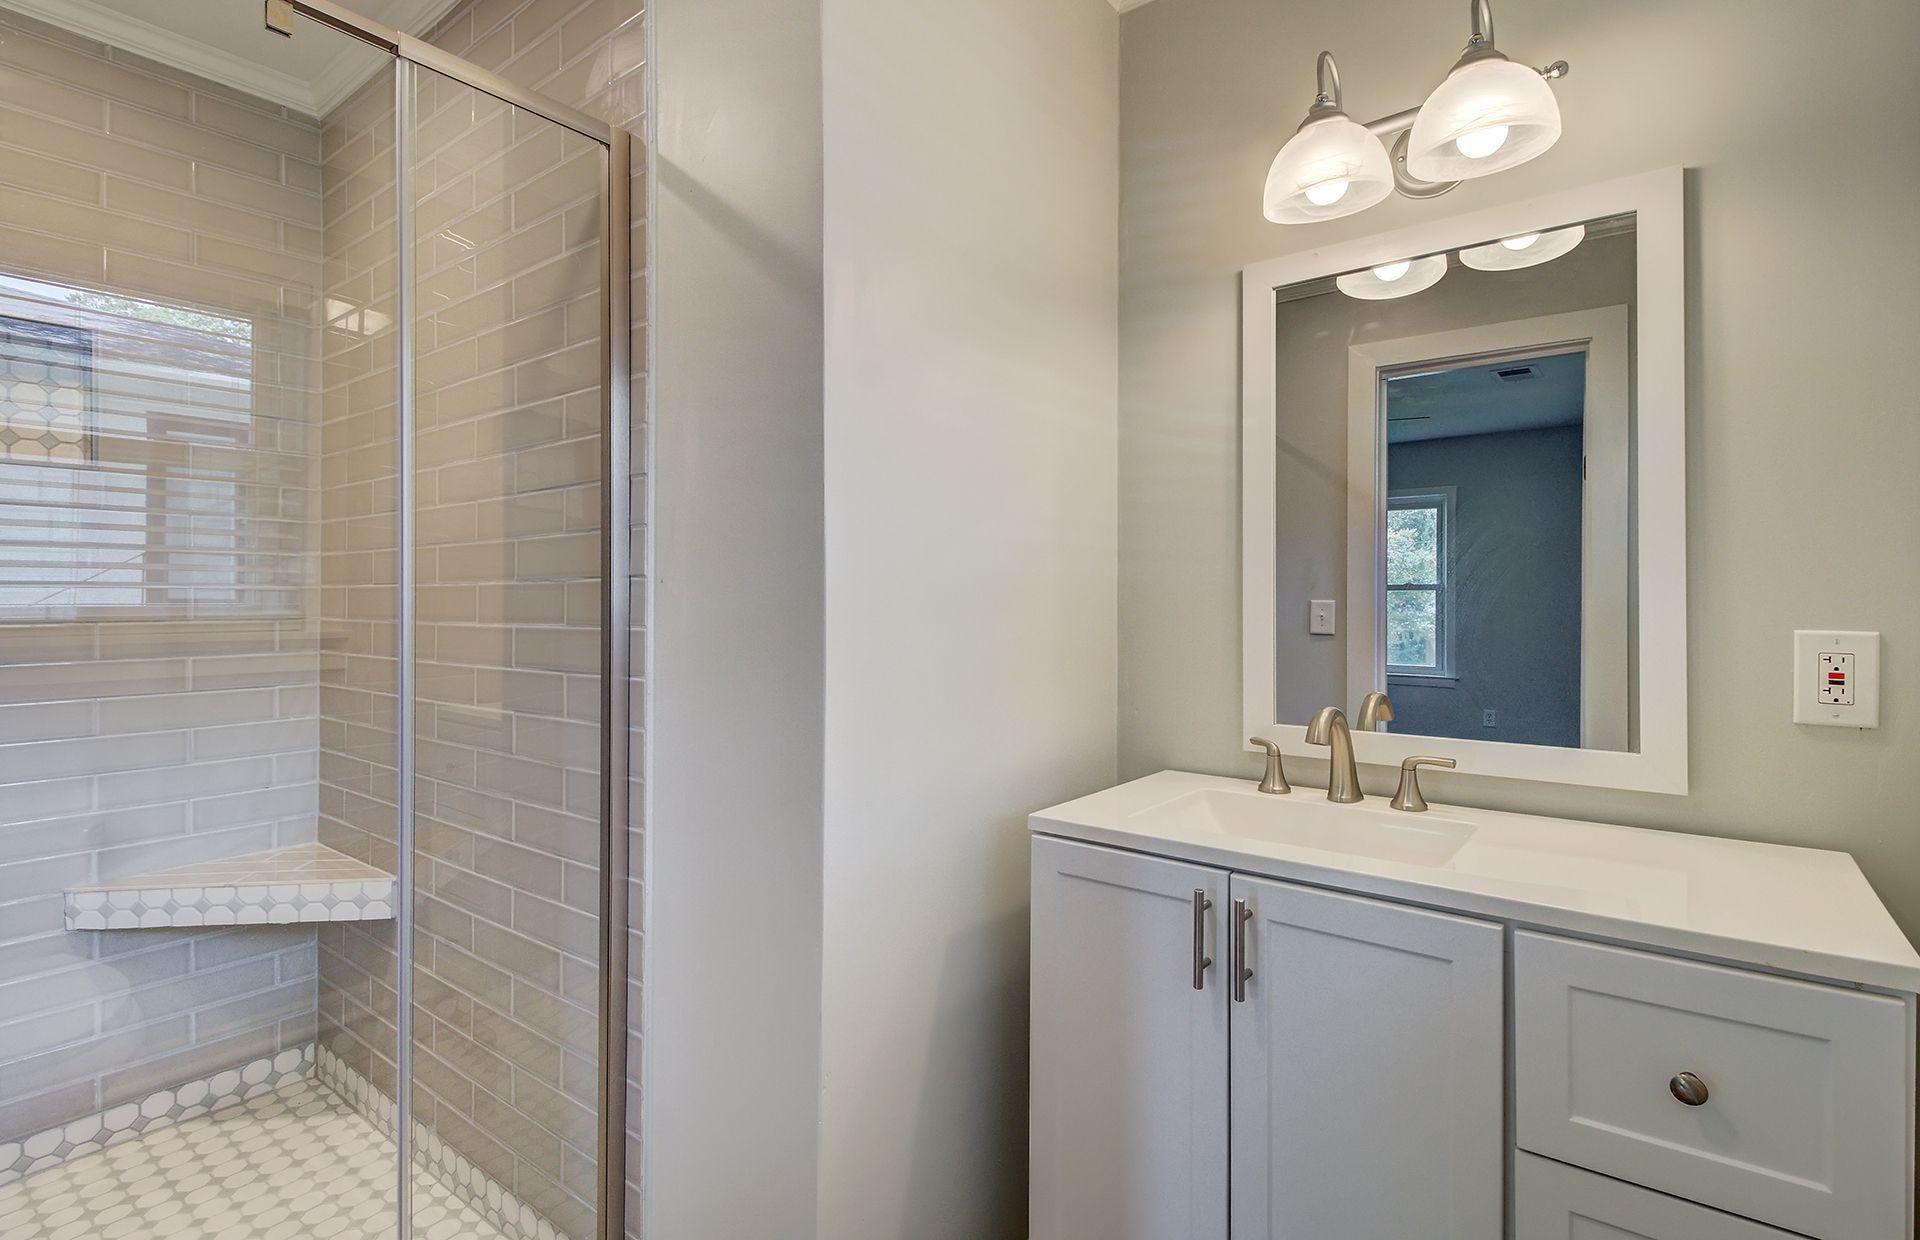 Belvedere Estates Homes For Sale - 6010 Ridgecrest, Hanahan, SC - 22